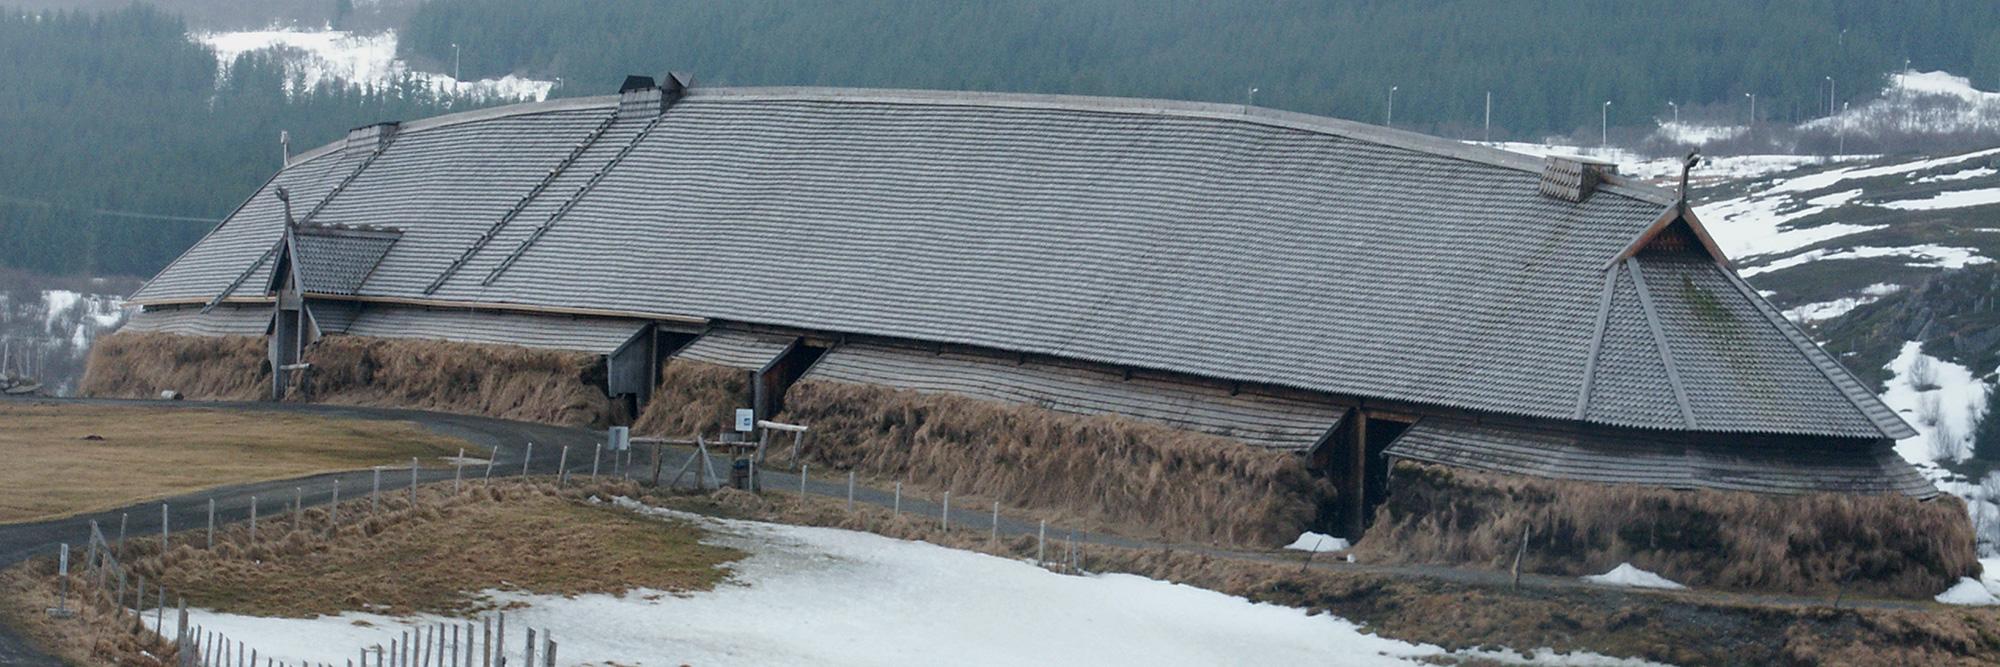 Musée Lofoten Hus Galleri